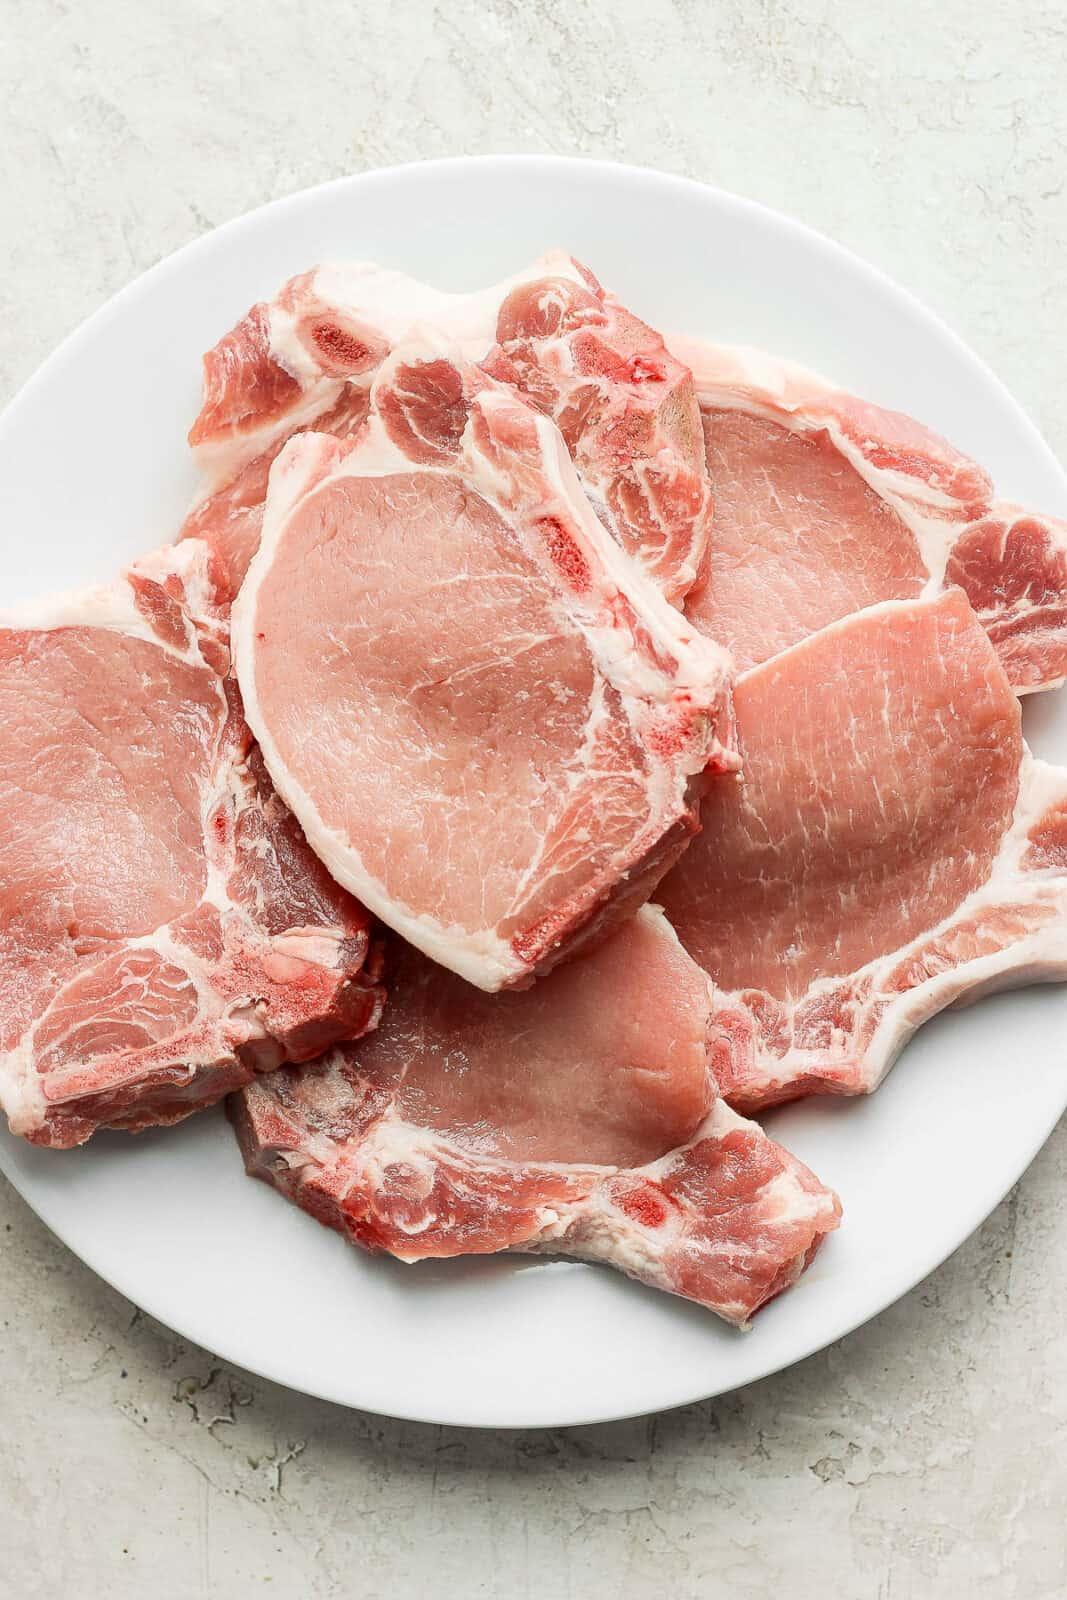 Plate of raw pork chops.